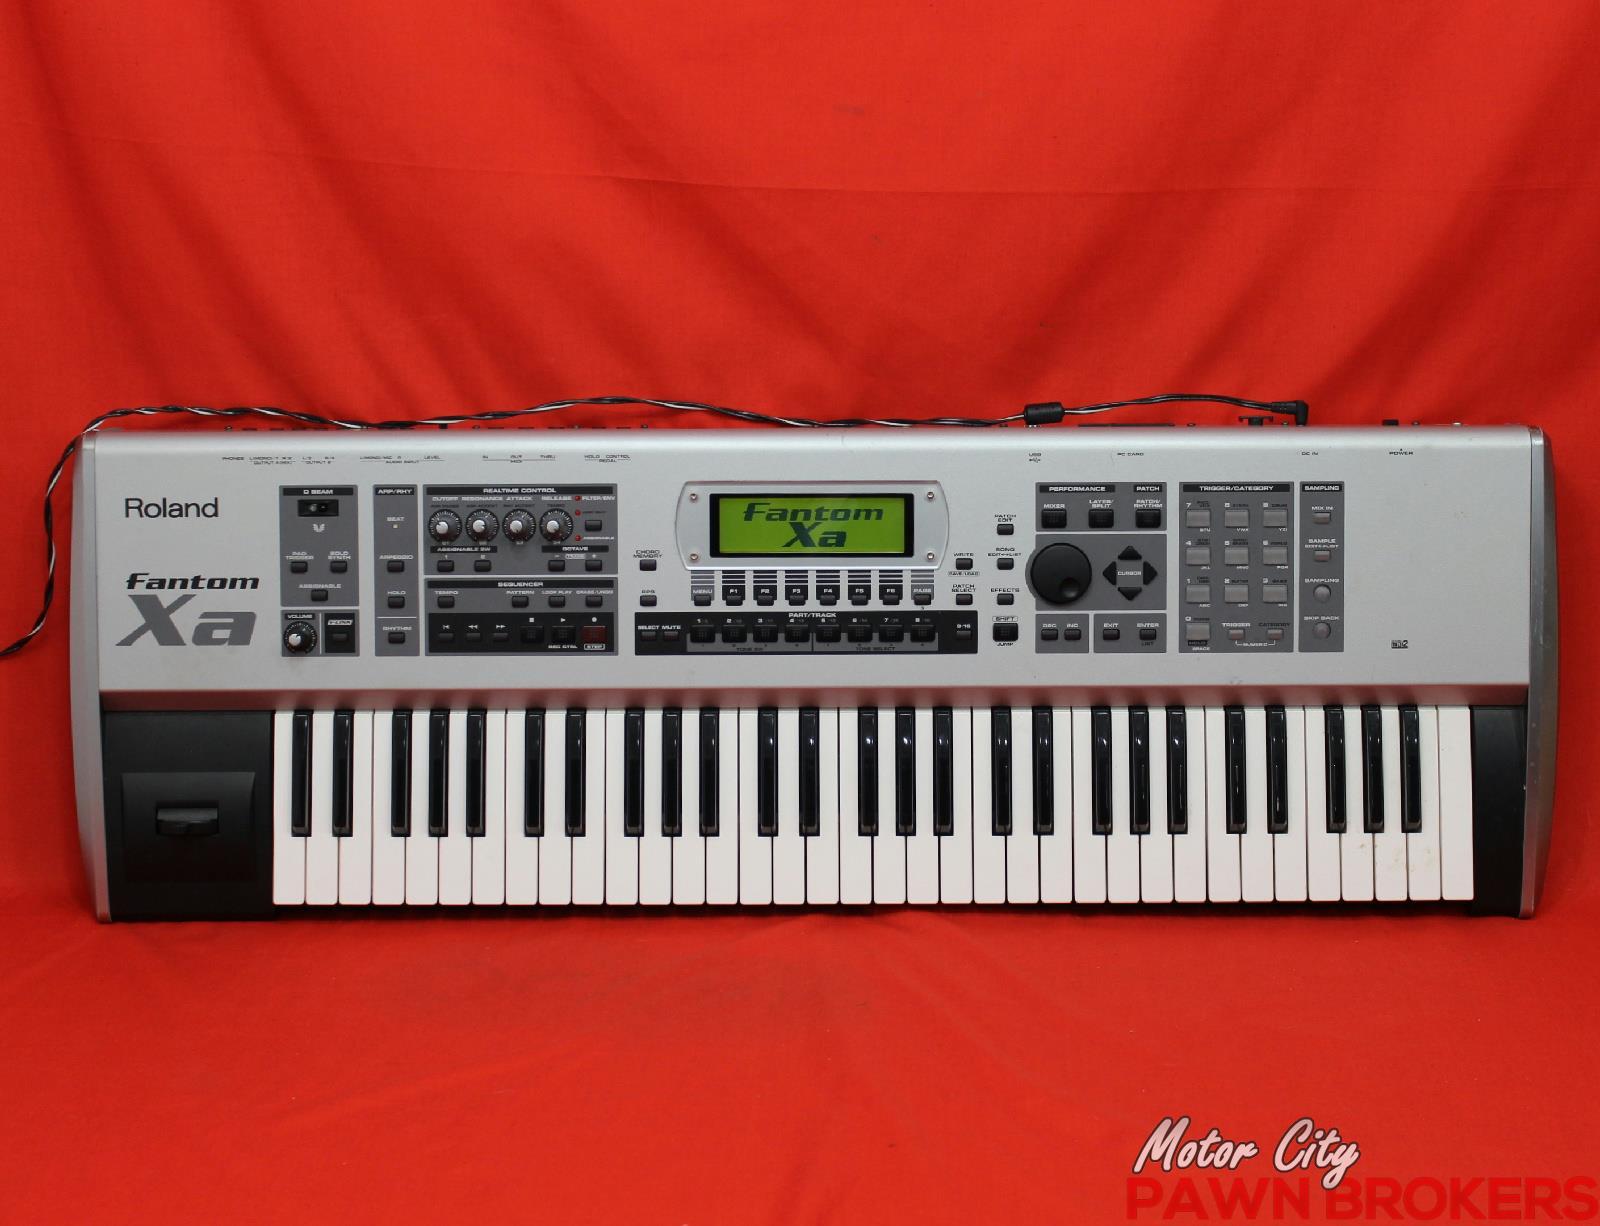 roland fantom xa 61 key sequencer 128 voice keyboard workstation as is. Black Bedroom Furniture Sets. Home Design Ideas